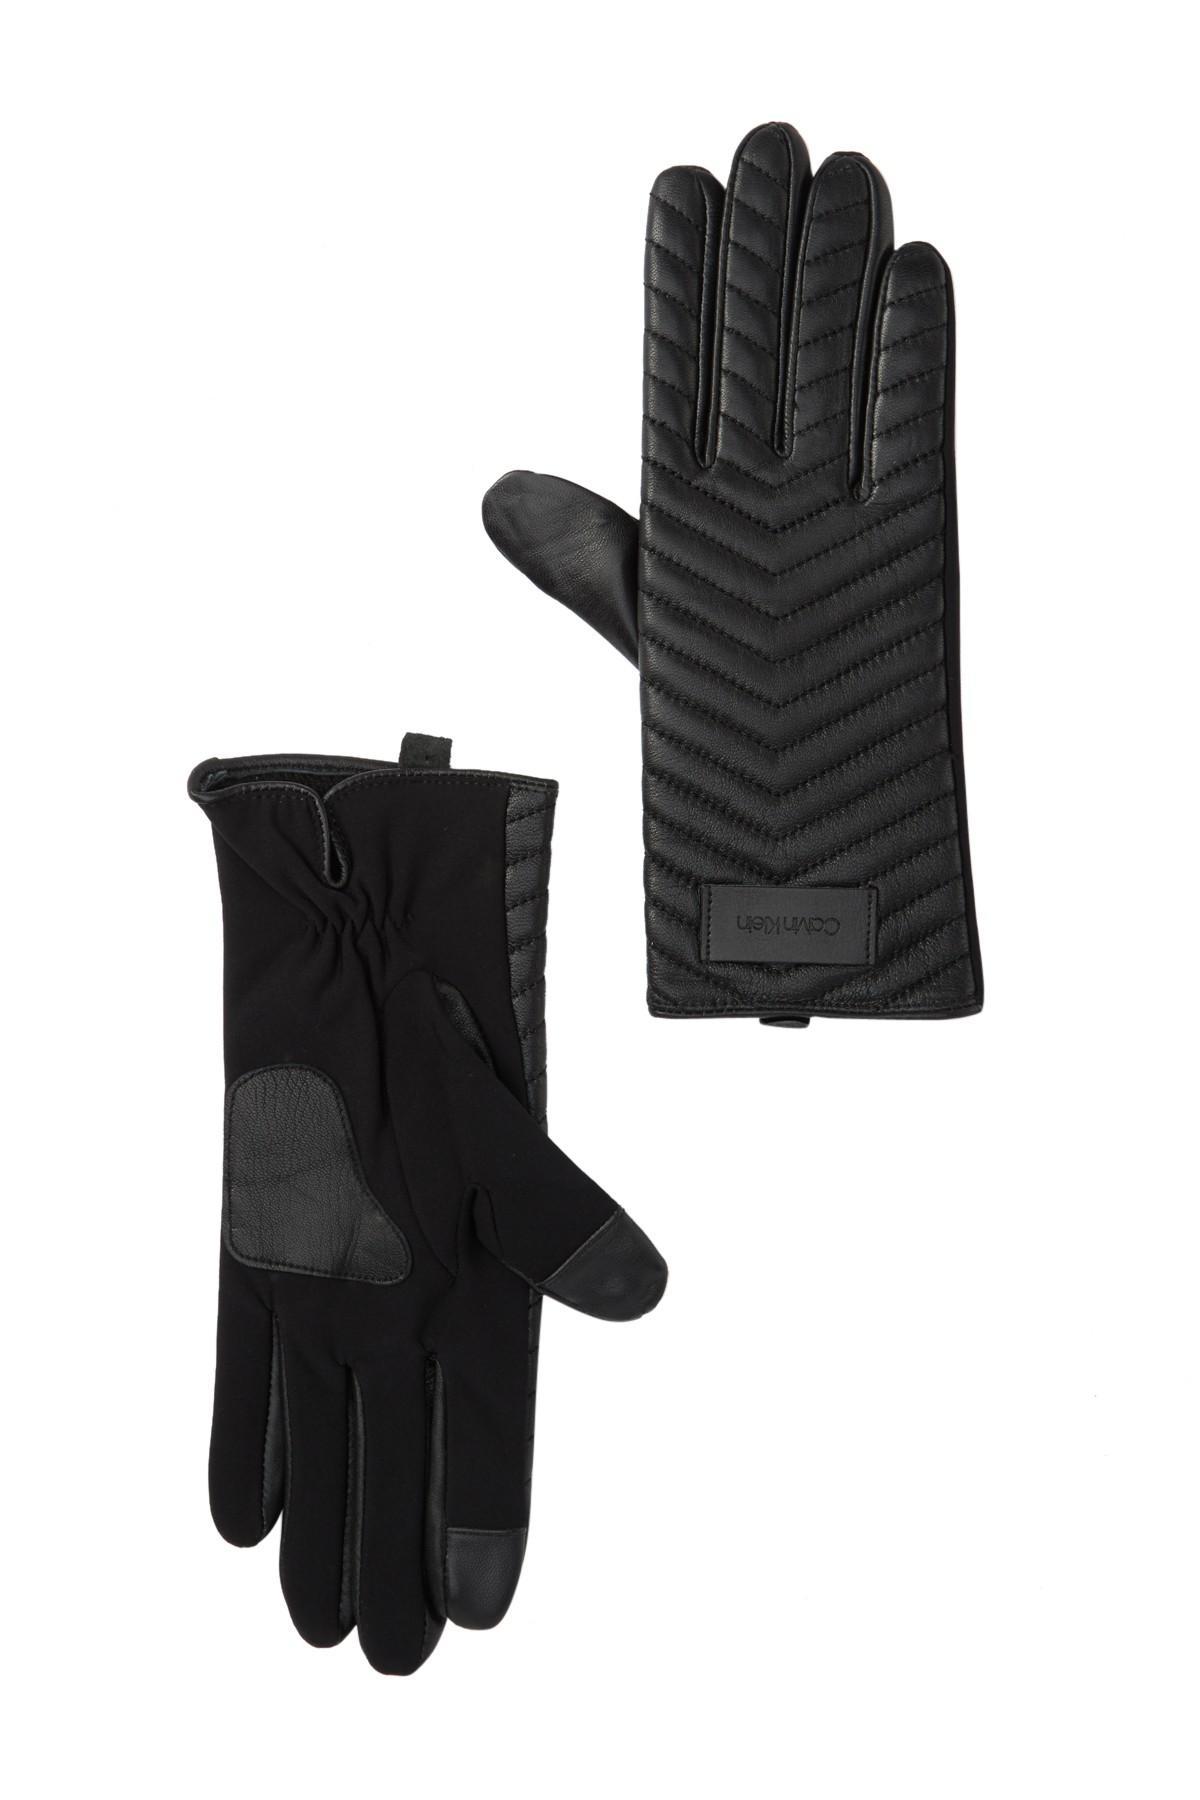 S Hombre Quiksilver Cross Gloves Black